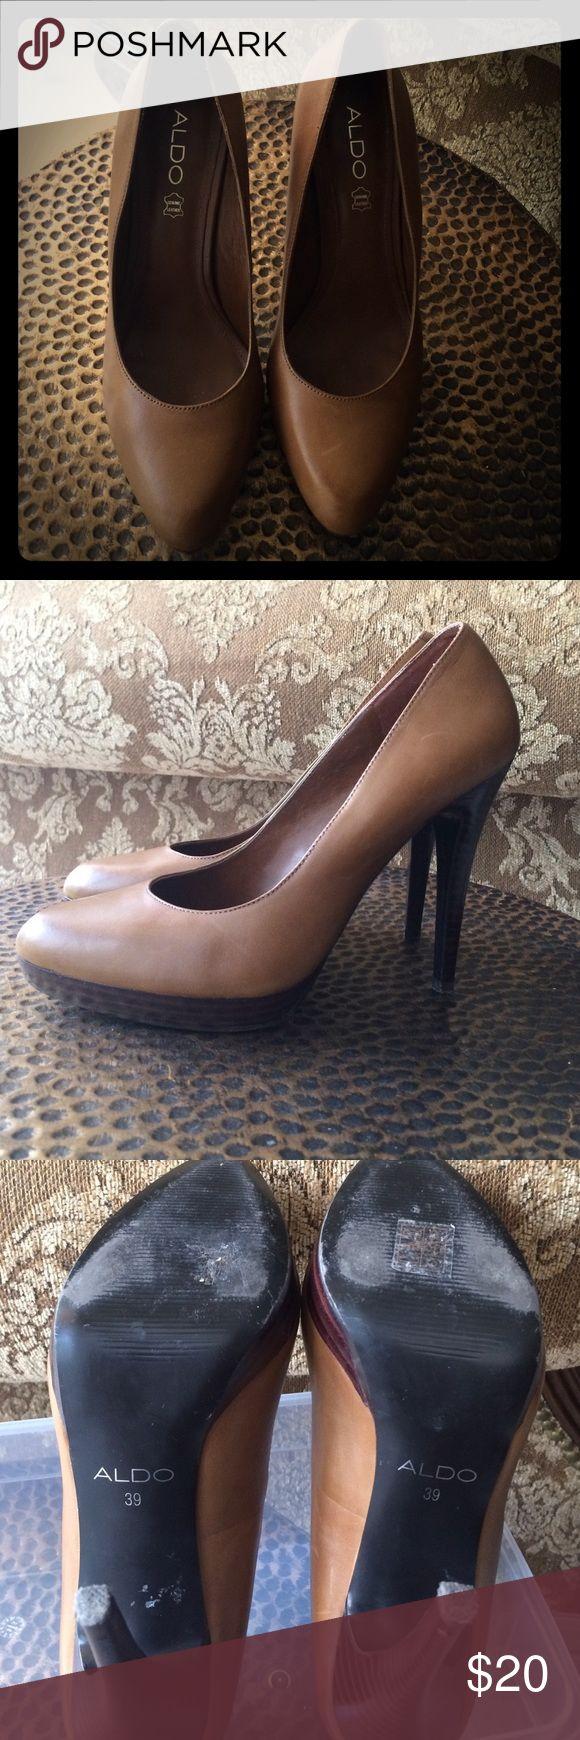 "❤️Aldo tan high heels Genuine leather,  5"" high heel with 3/4"" base platform. Camel/tan color in good condition. Aldo Shoes Heels"